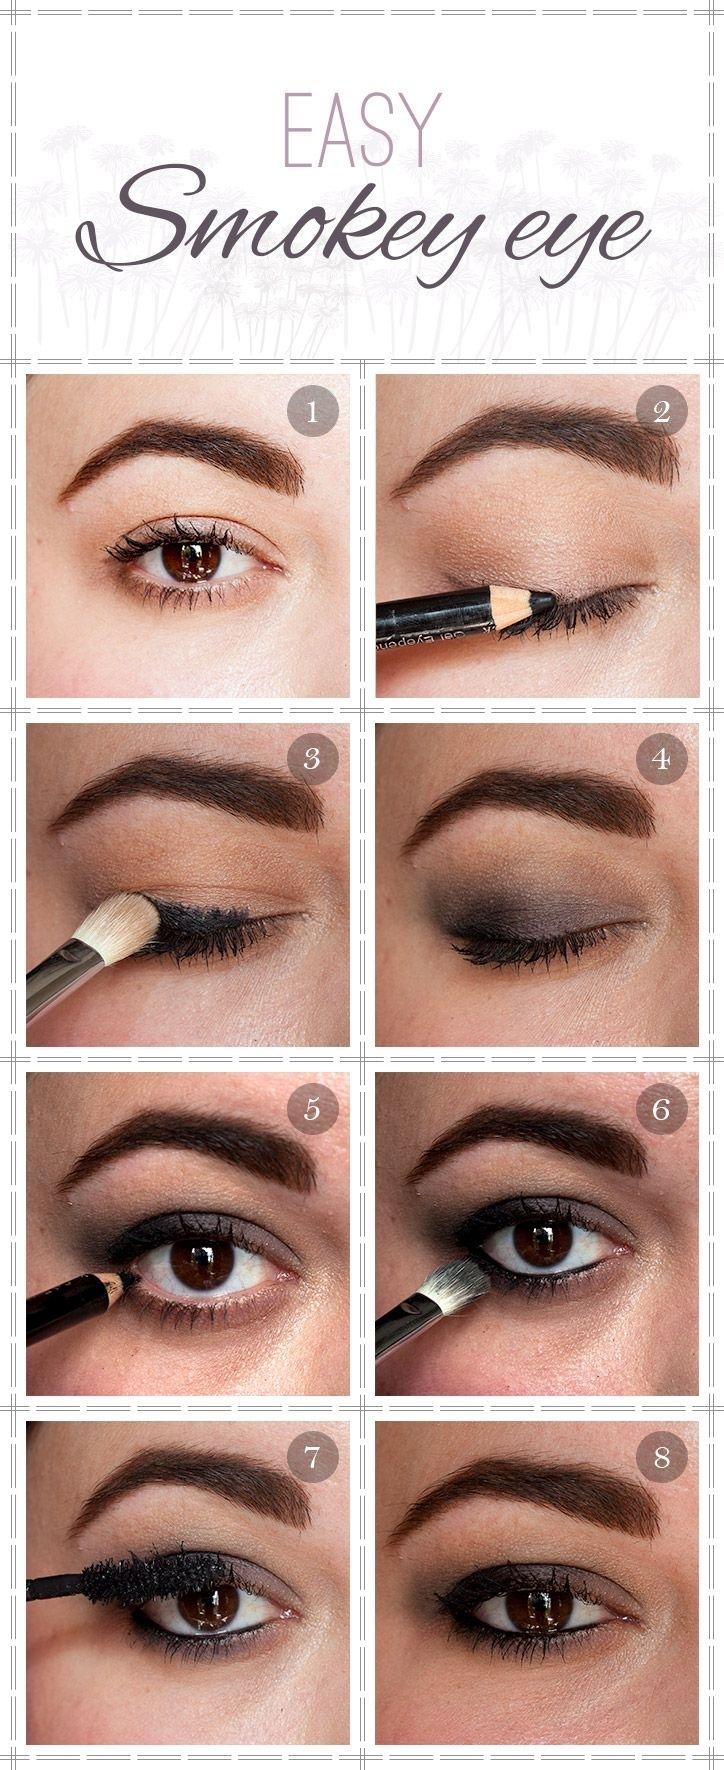 Easy Smokey Eye Tutorial | Beauty Tips | Pinterest | Maquillaje throughout Easy Smokey Eye Makeup Tutorial